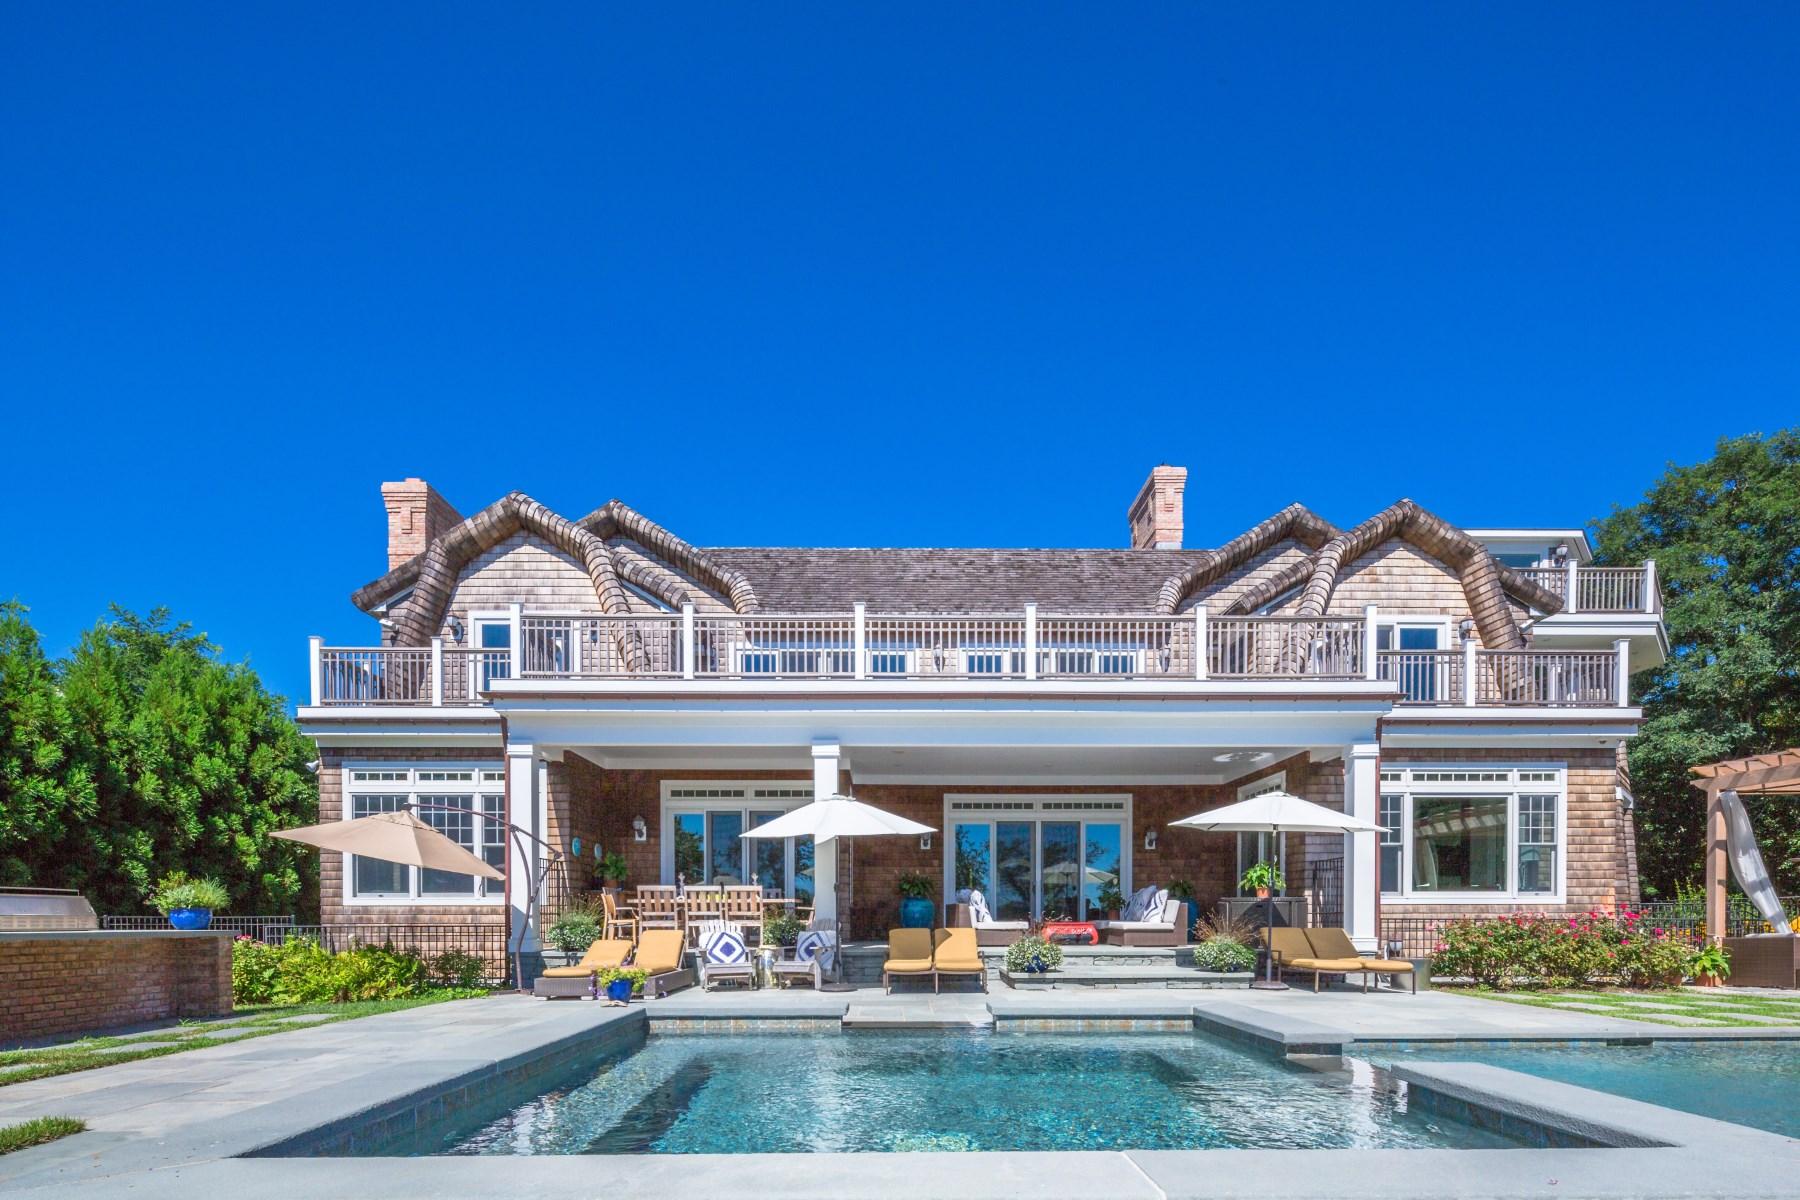 Single Family Home for Sale at Extraordinary Waterfront Estate 21 Kellis Way Bridgehampton, New York, 11932 United States